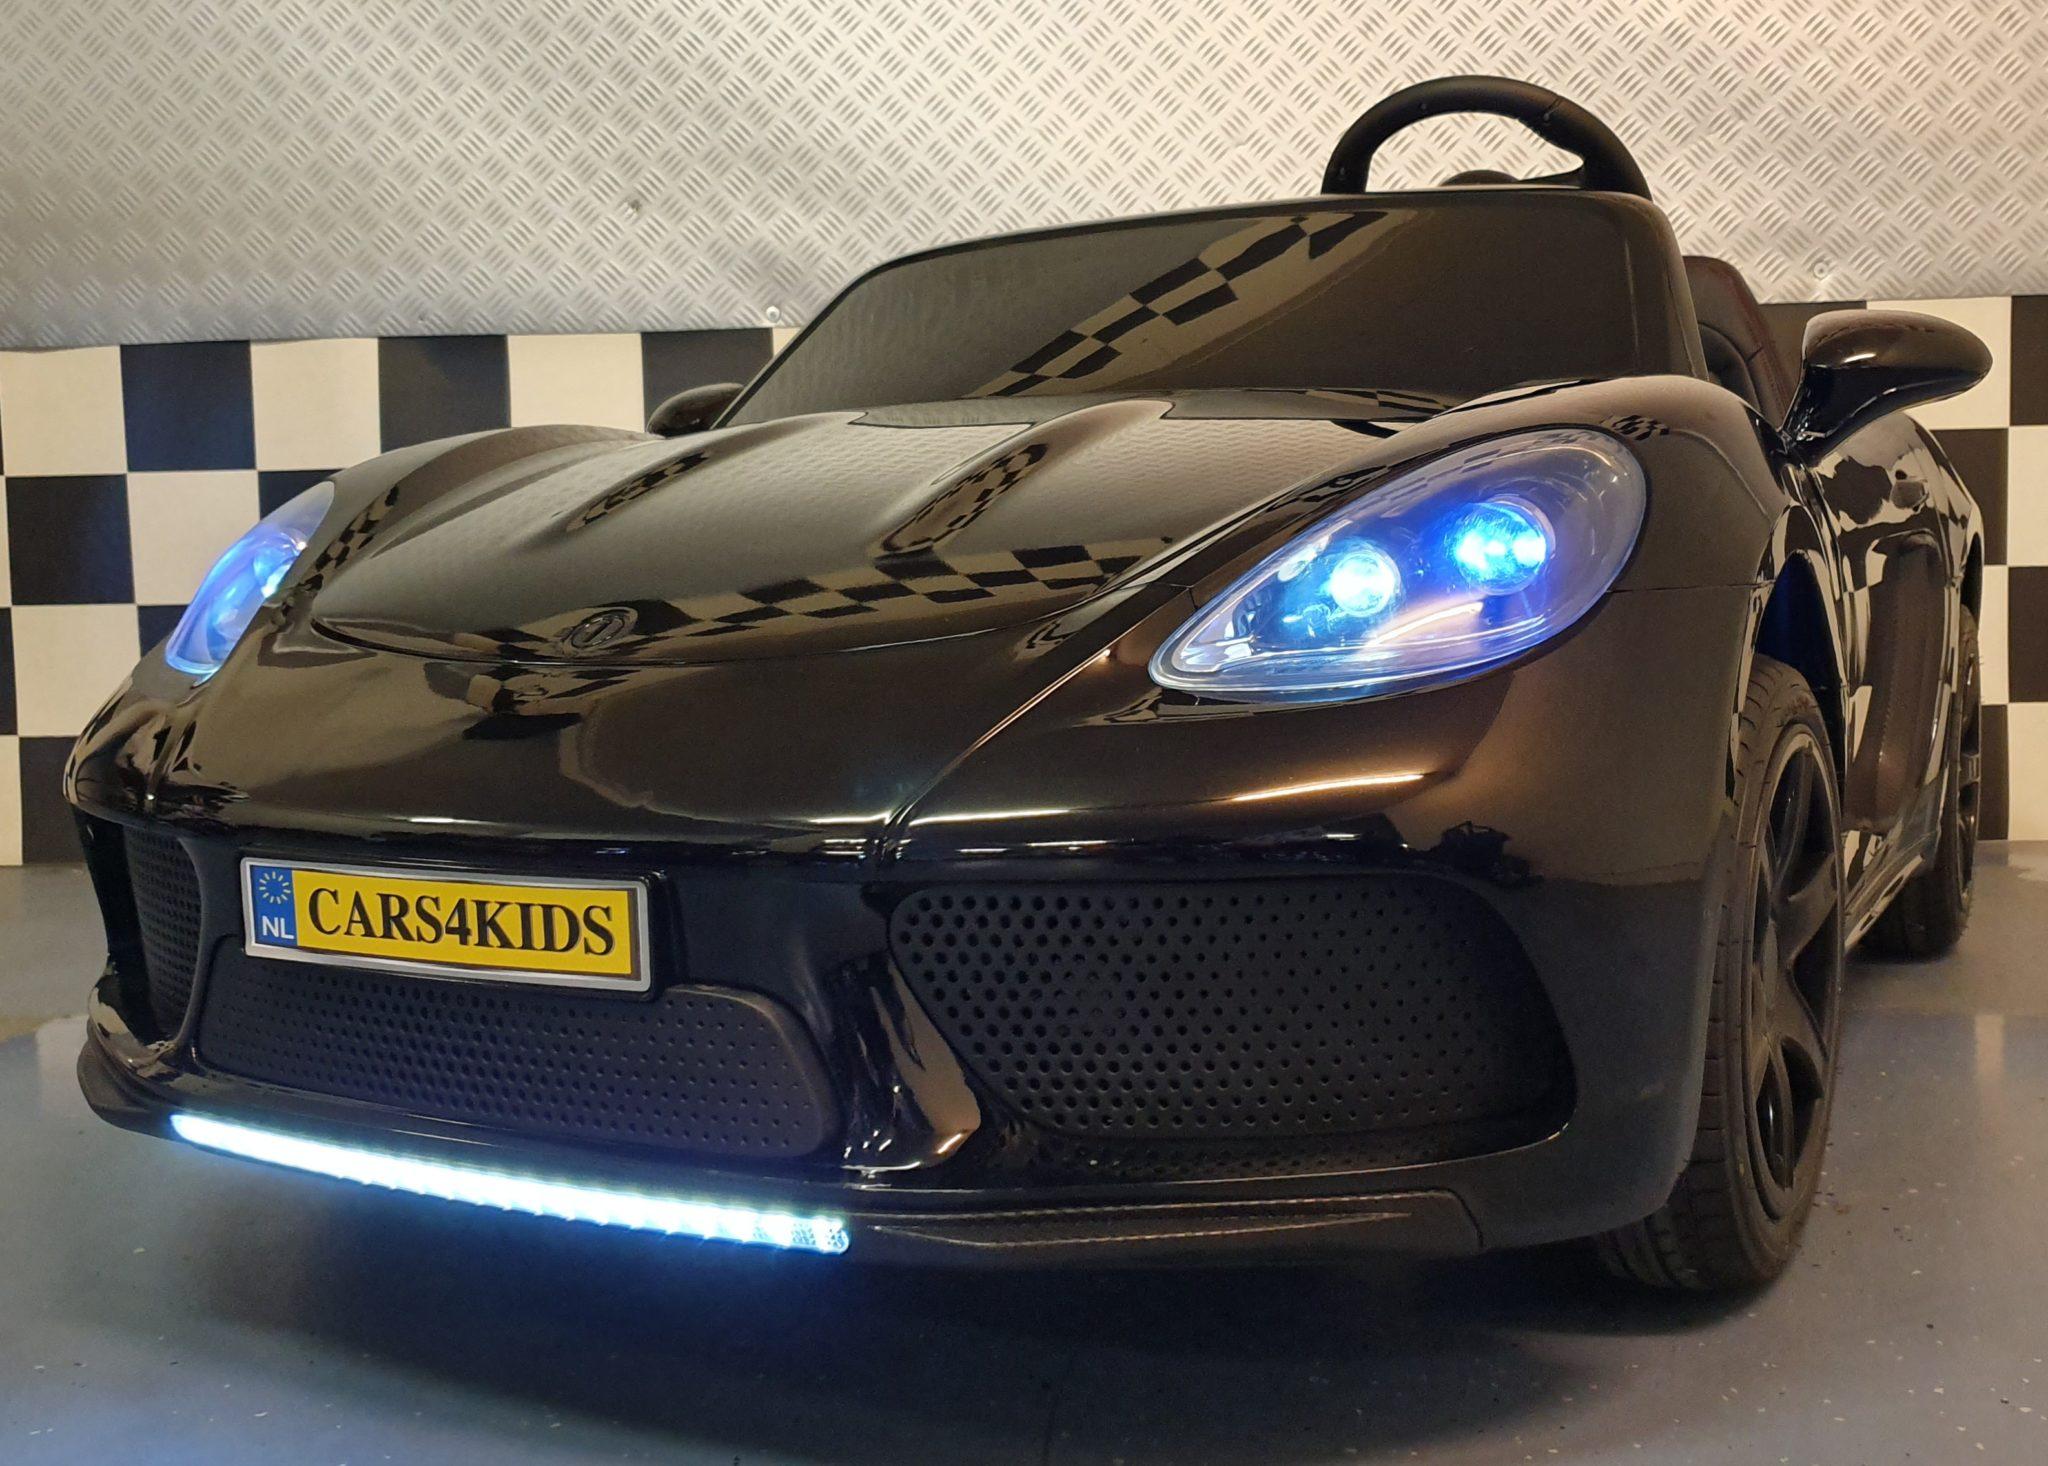 Accu kinderauto 24 volt 2 persoons met brushless motor Metallic zwart